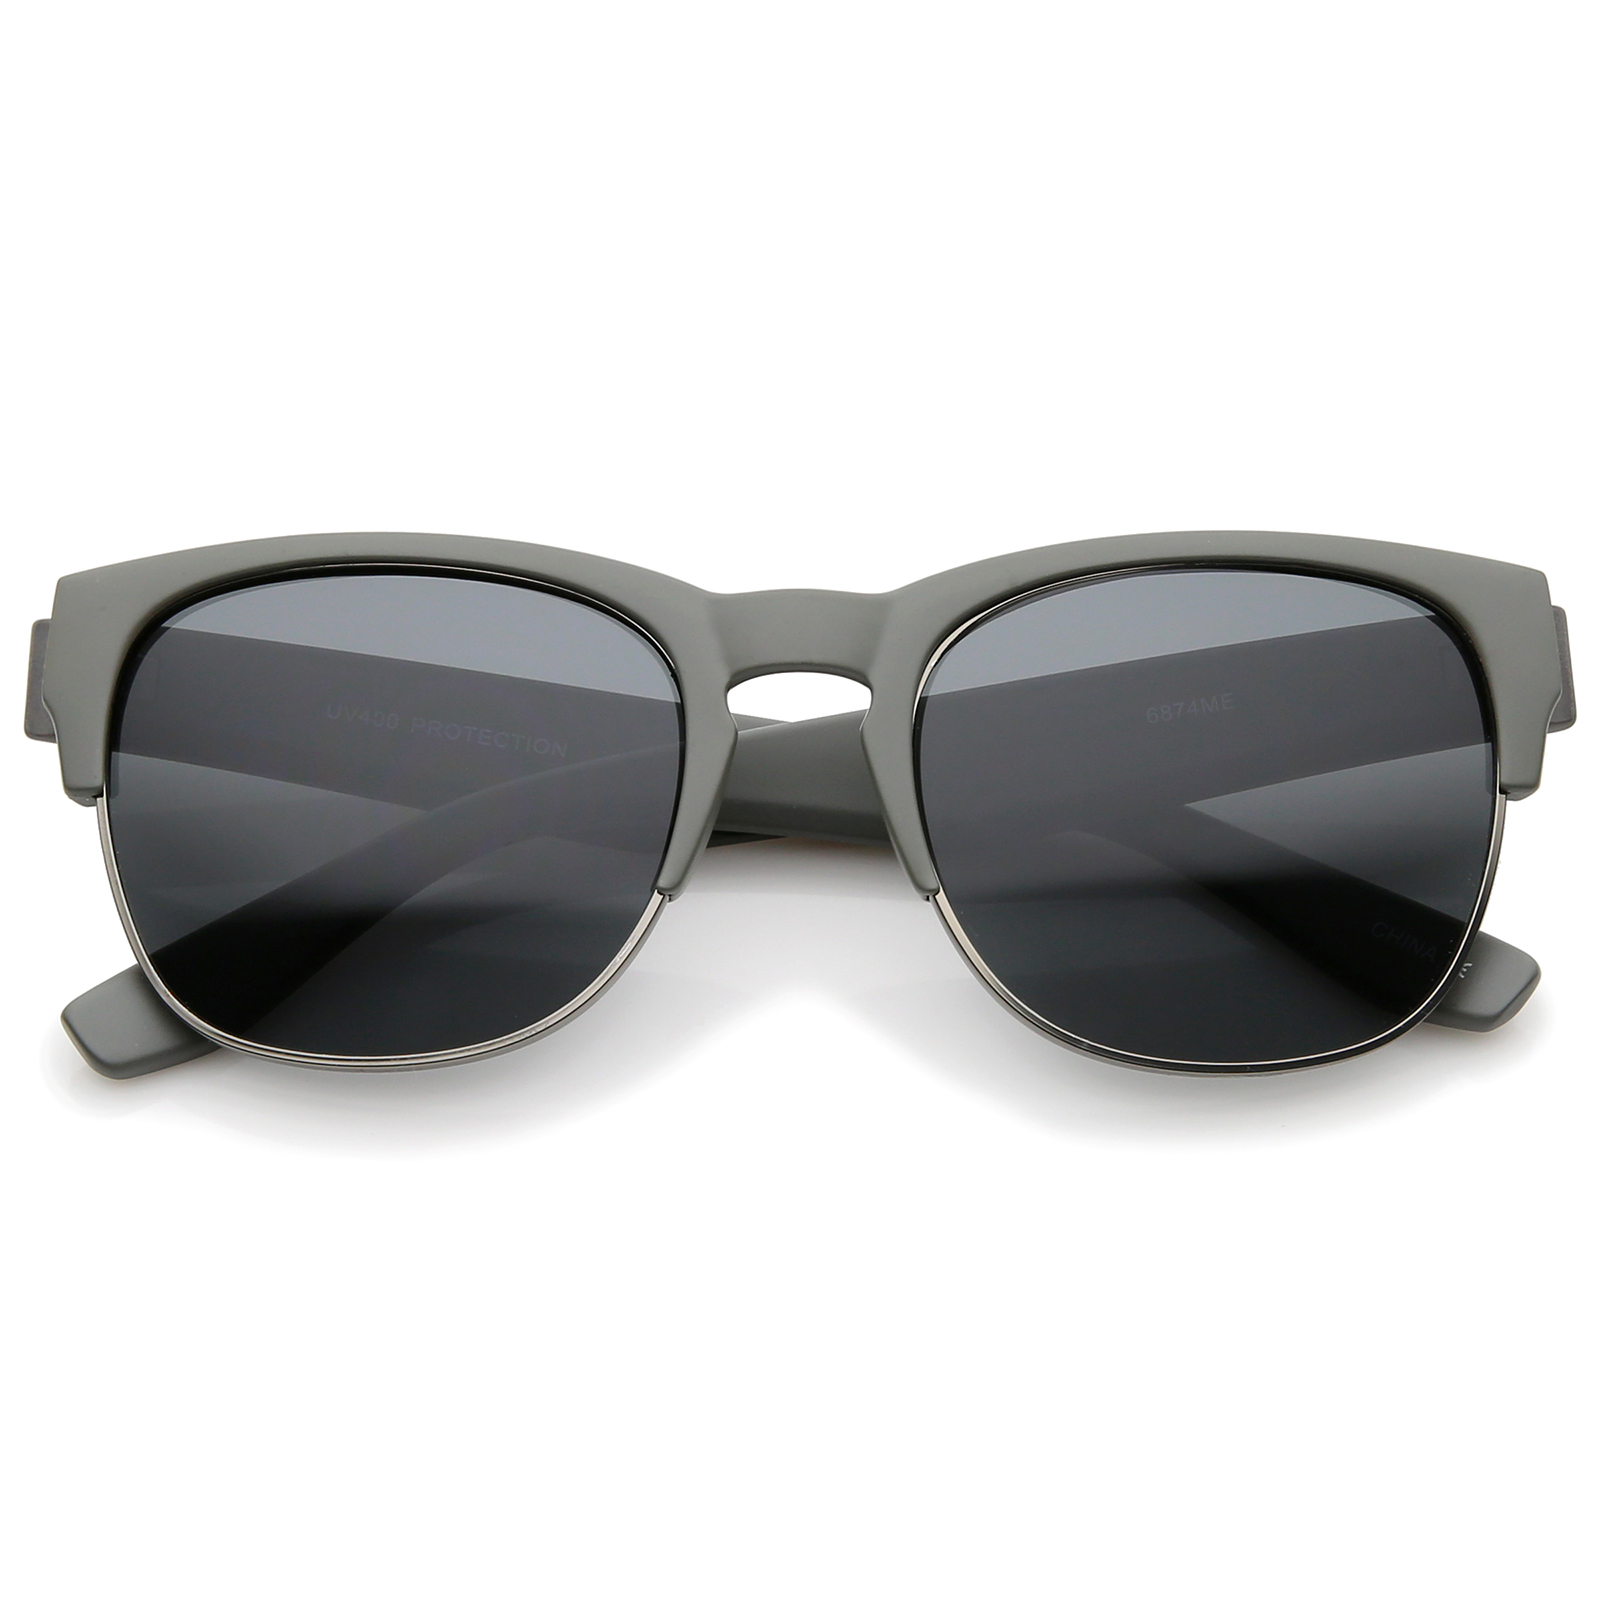 Glasses Frames Wide Bridge : sunglass.LA Contemporary Wide Temple Keyhole Nose Bridge ...